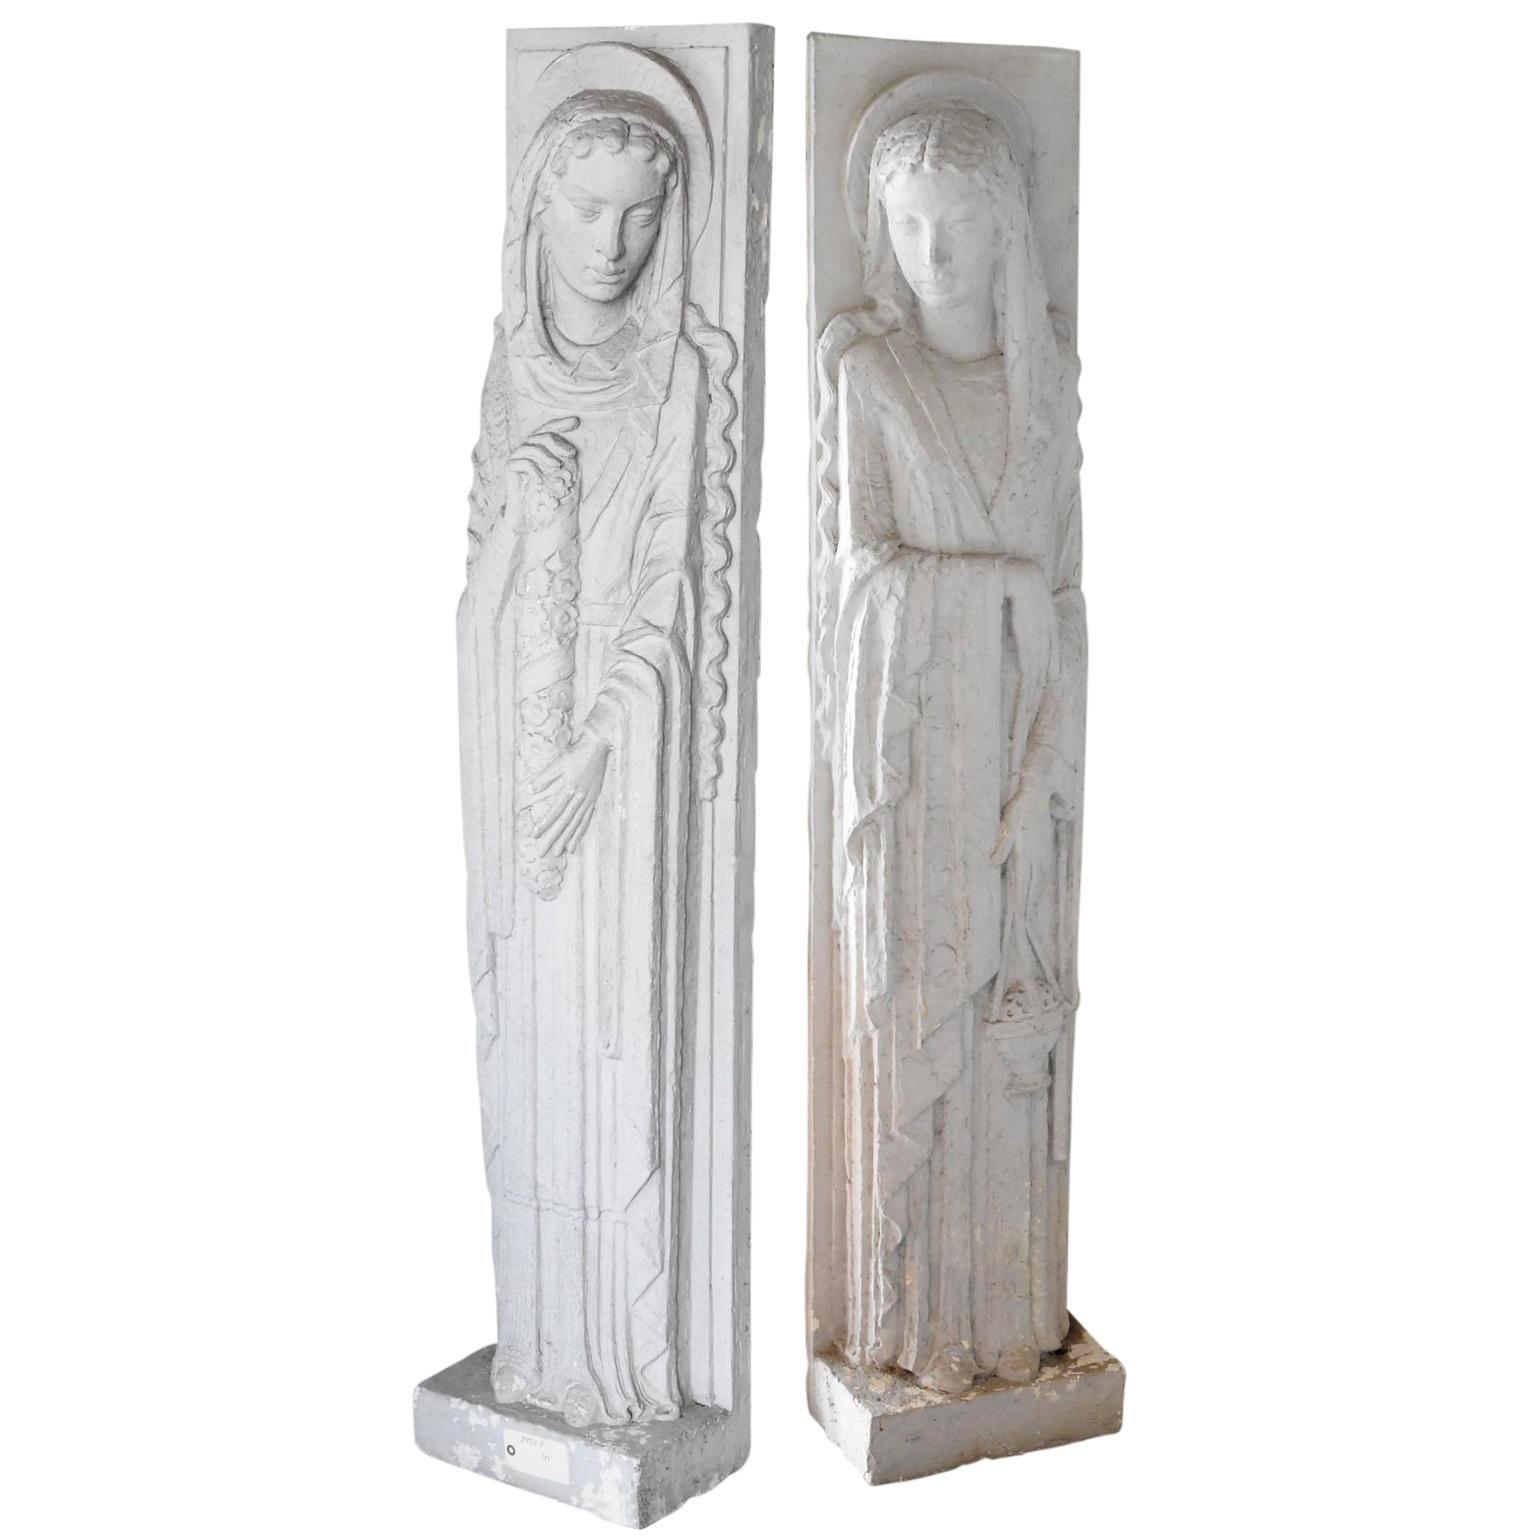 Two Art Deco Plaster Sculptures, circa 1930